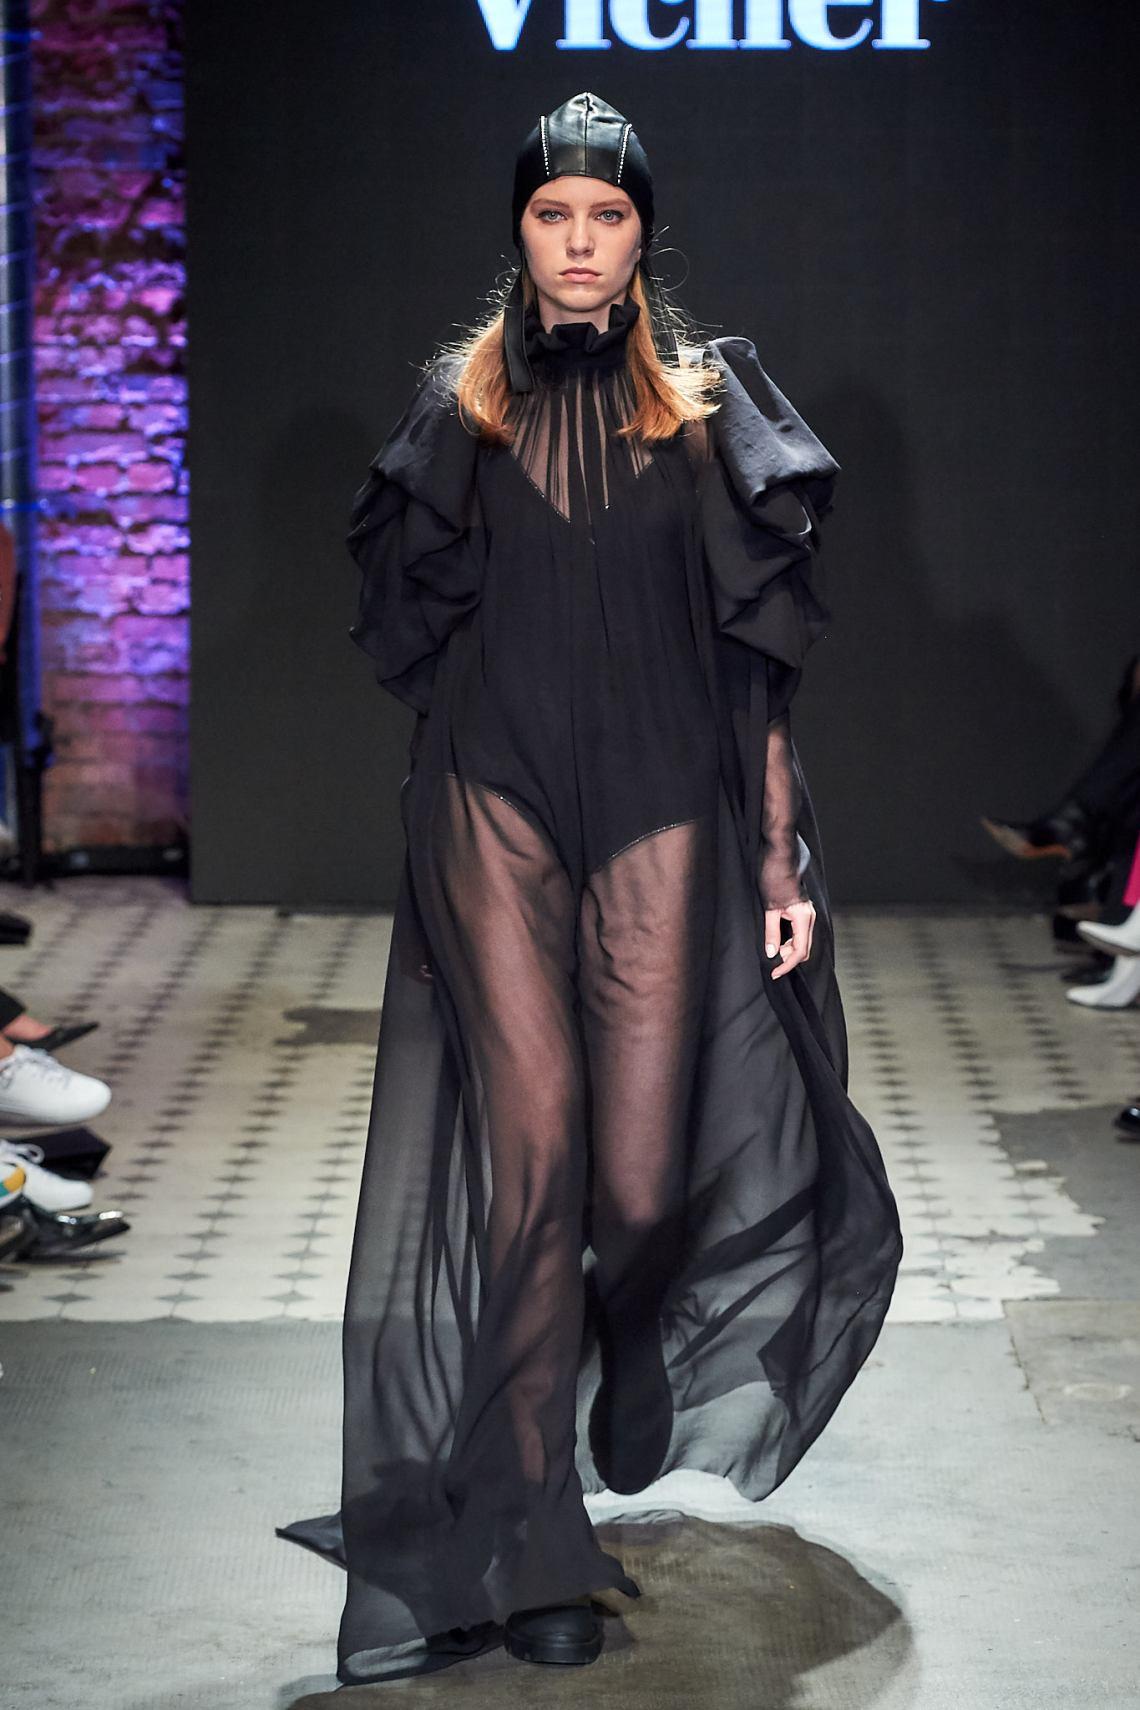 12_KTW_DAY2_121019_VICHER_lowres-fotFilipOkopny-FashionImages